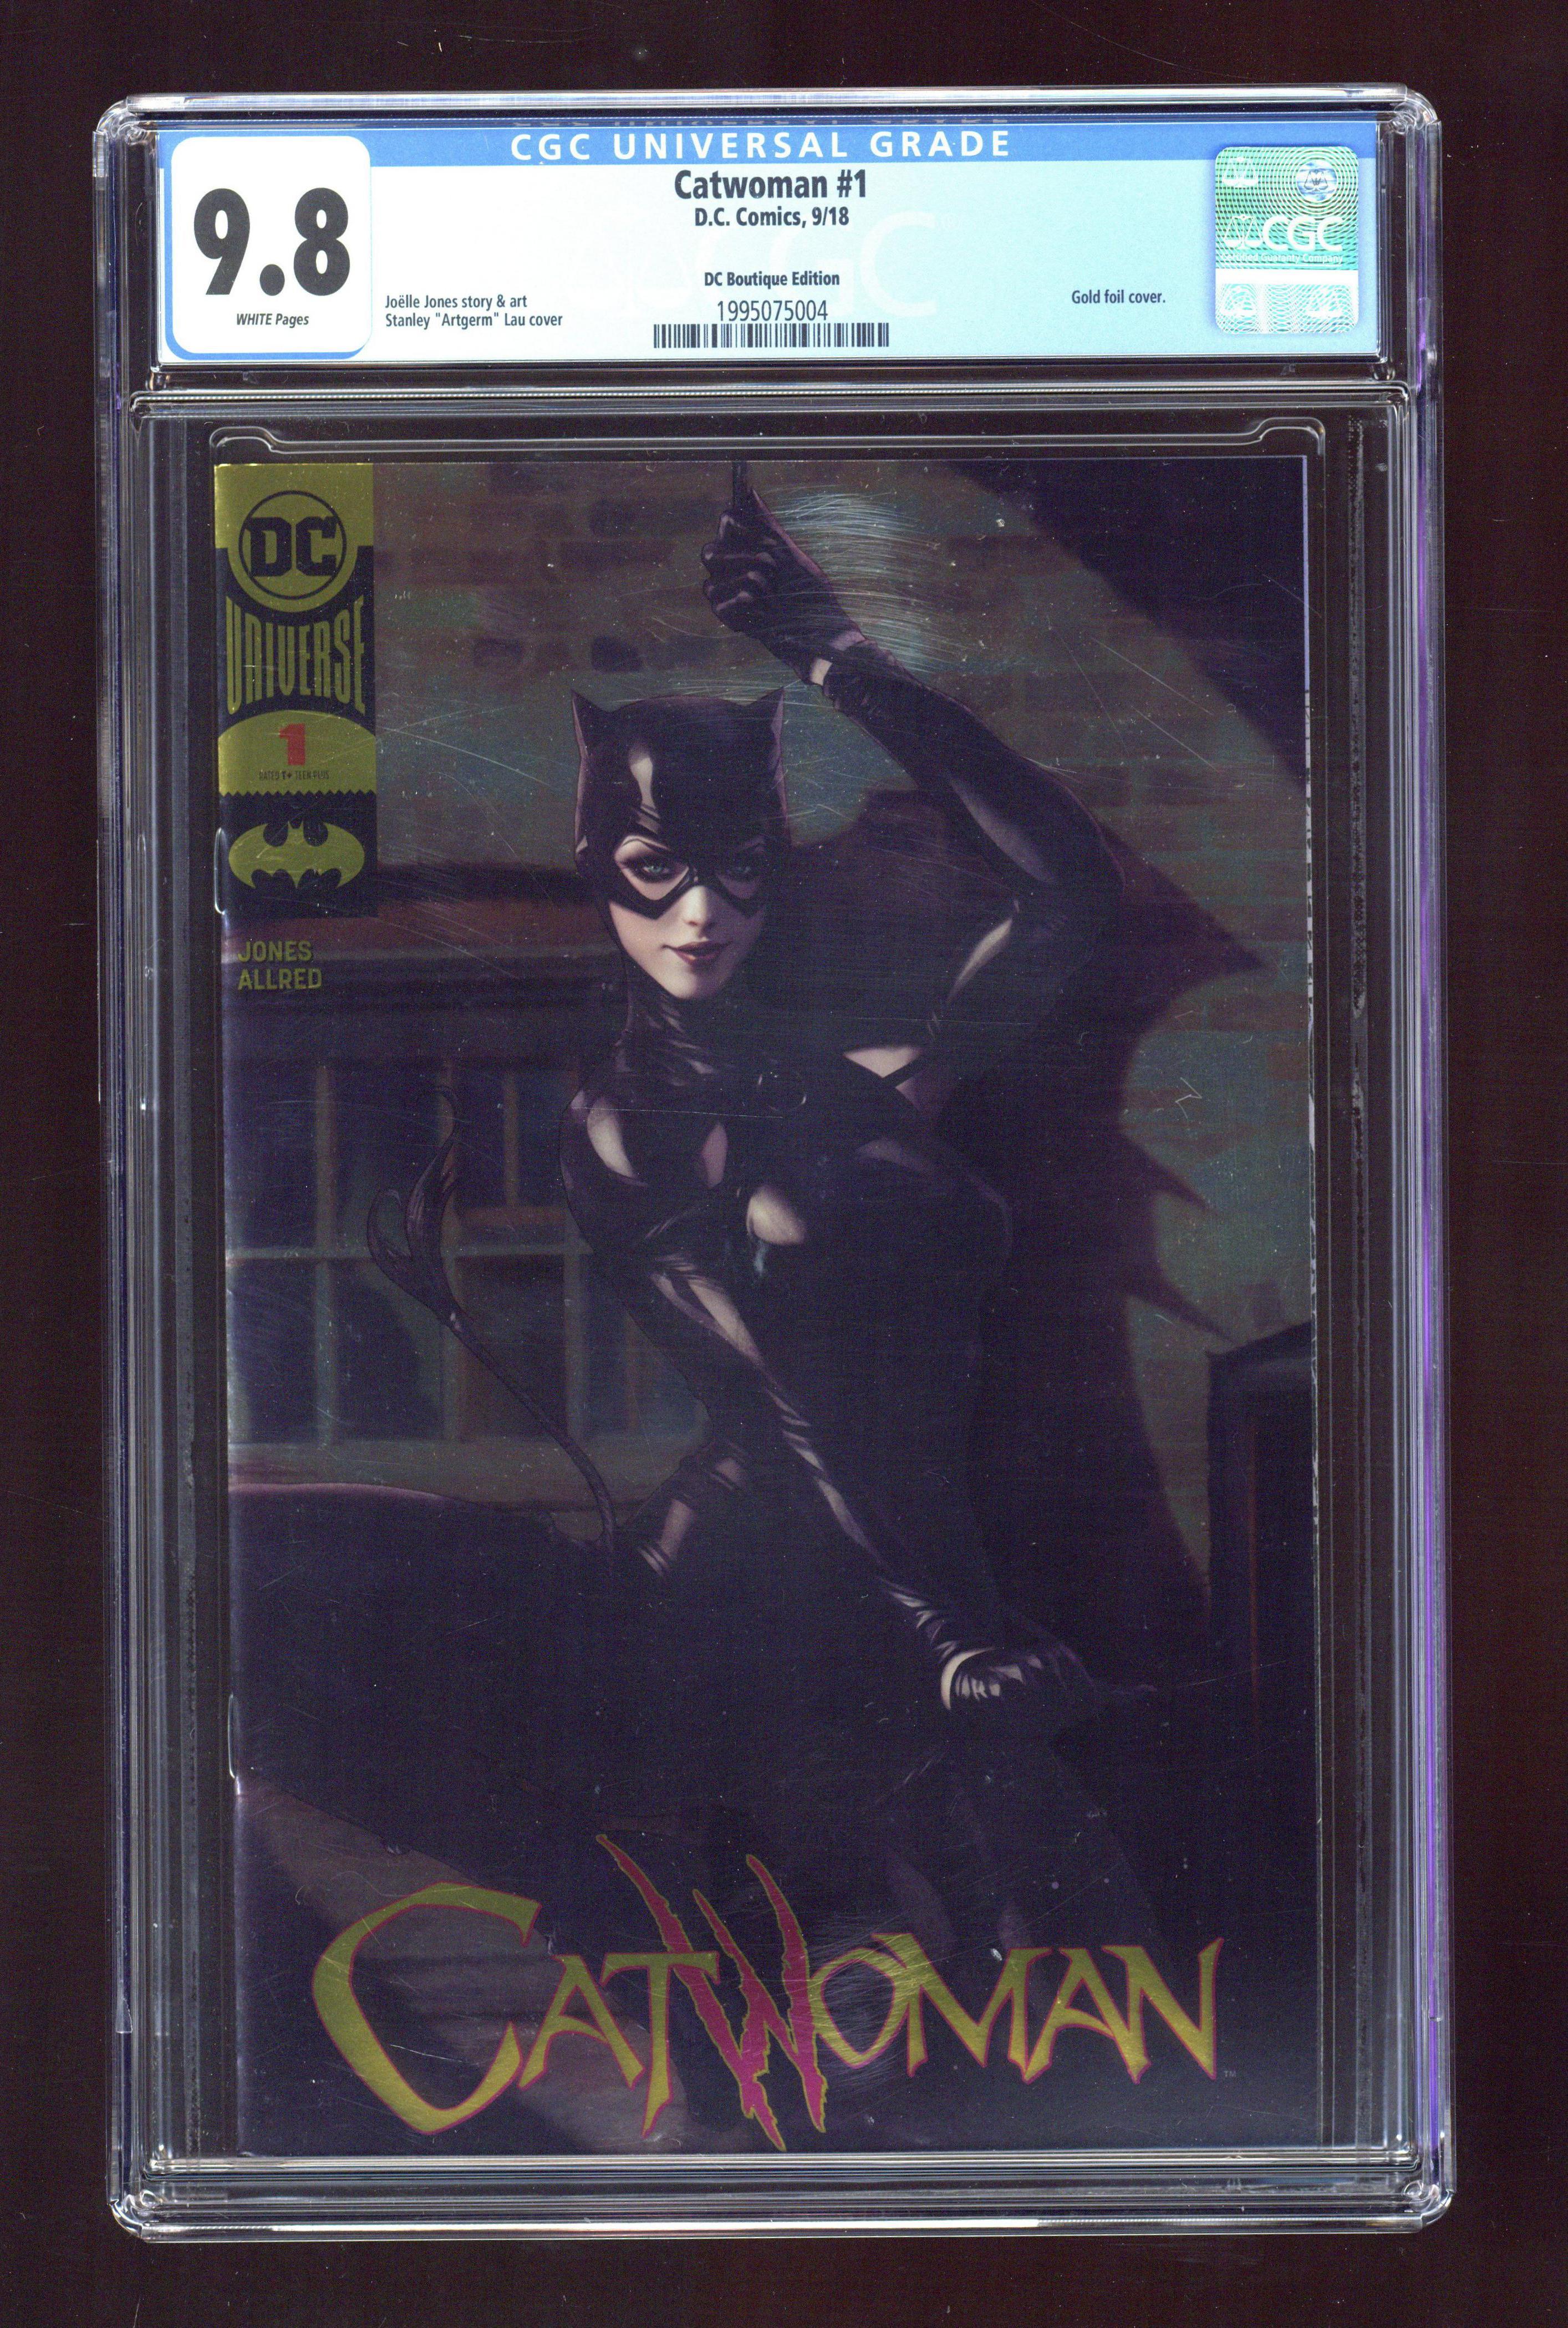 Comic books in 'Batman', graded by CGC